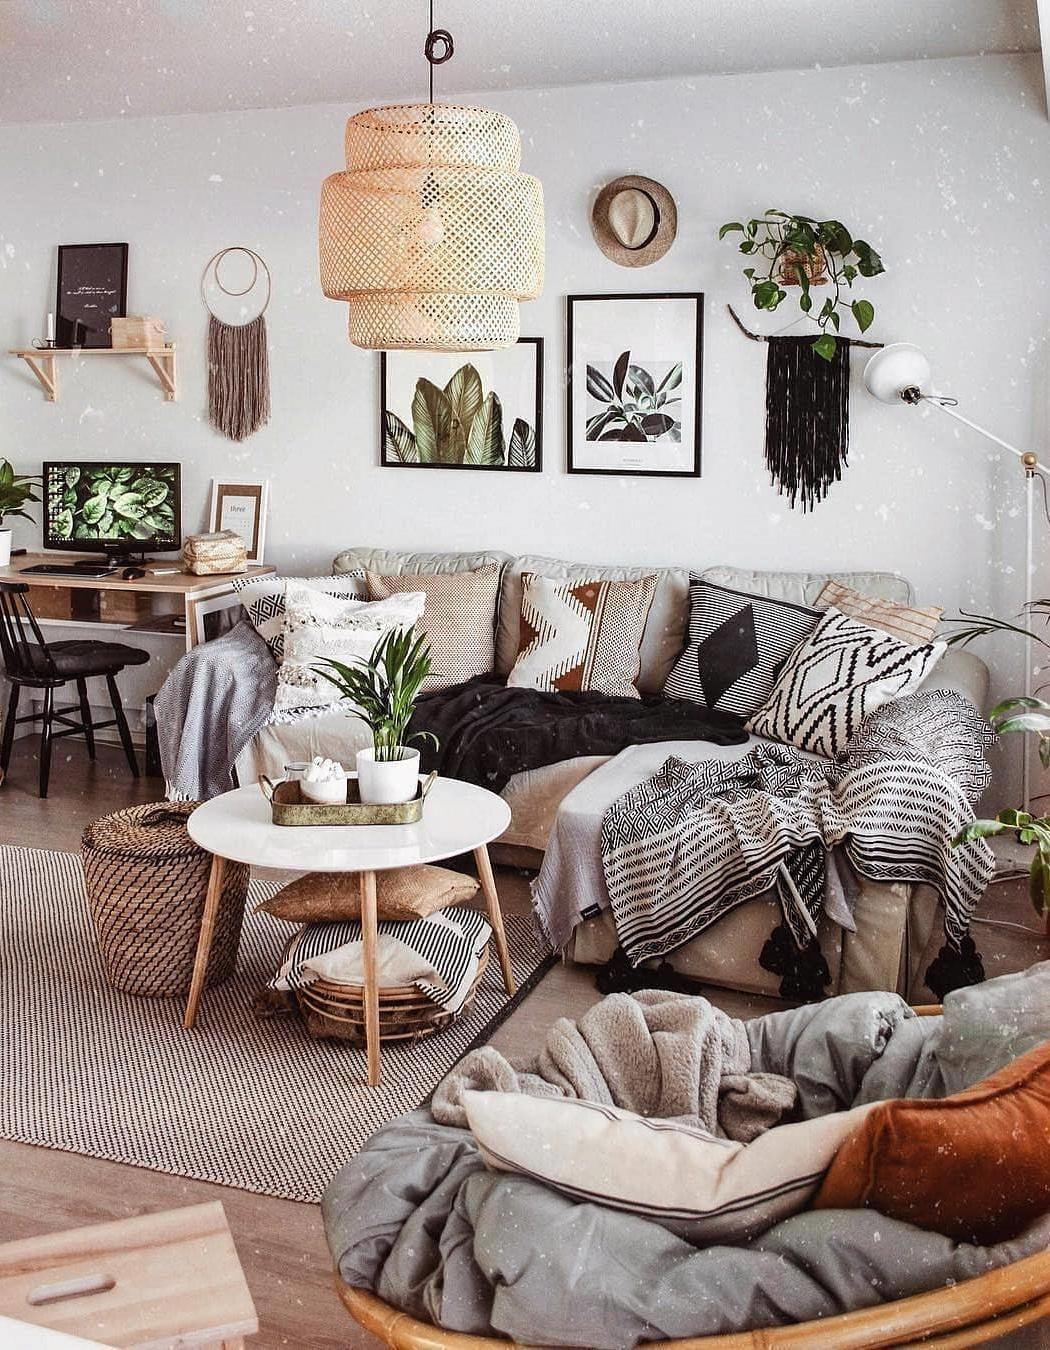 50 Inspiring Living Room Decorating Ideas Living Room Decor Boho Living Room Home Decor Bedroom